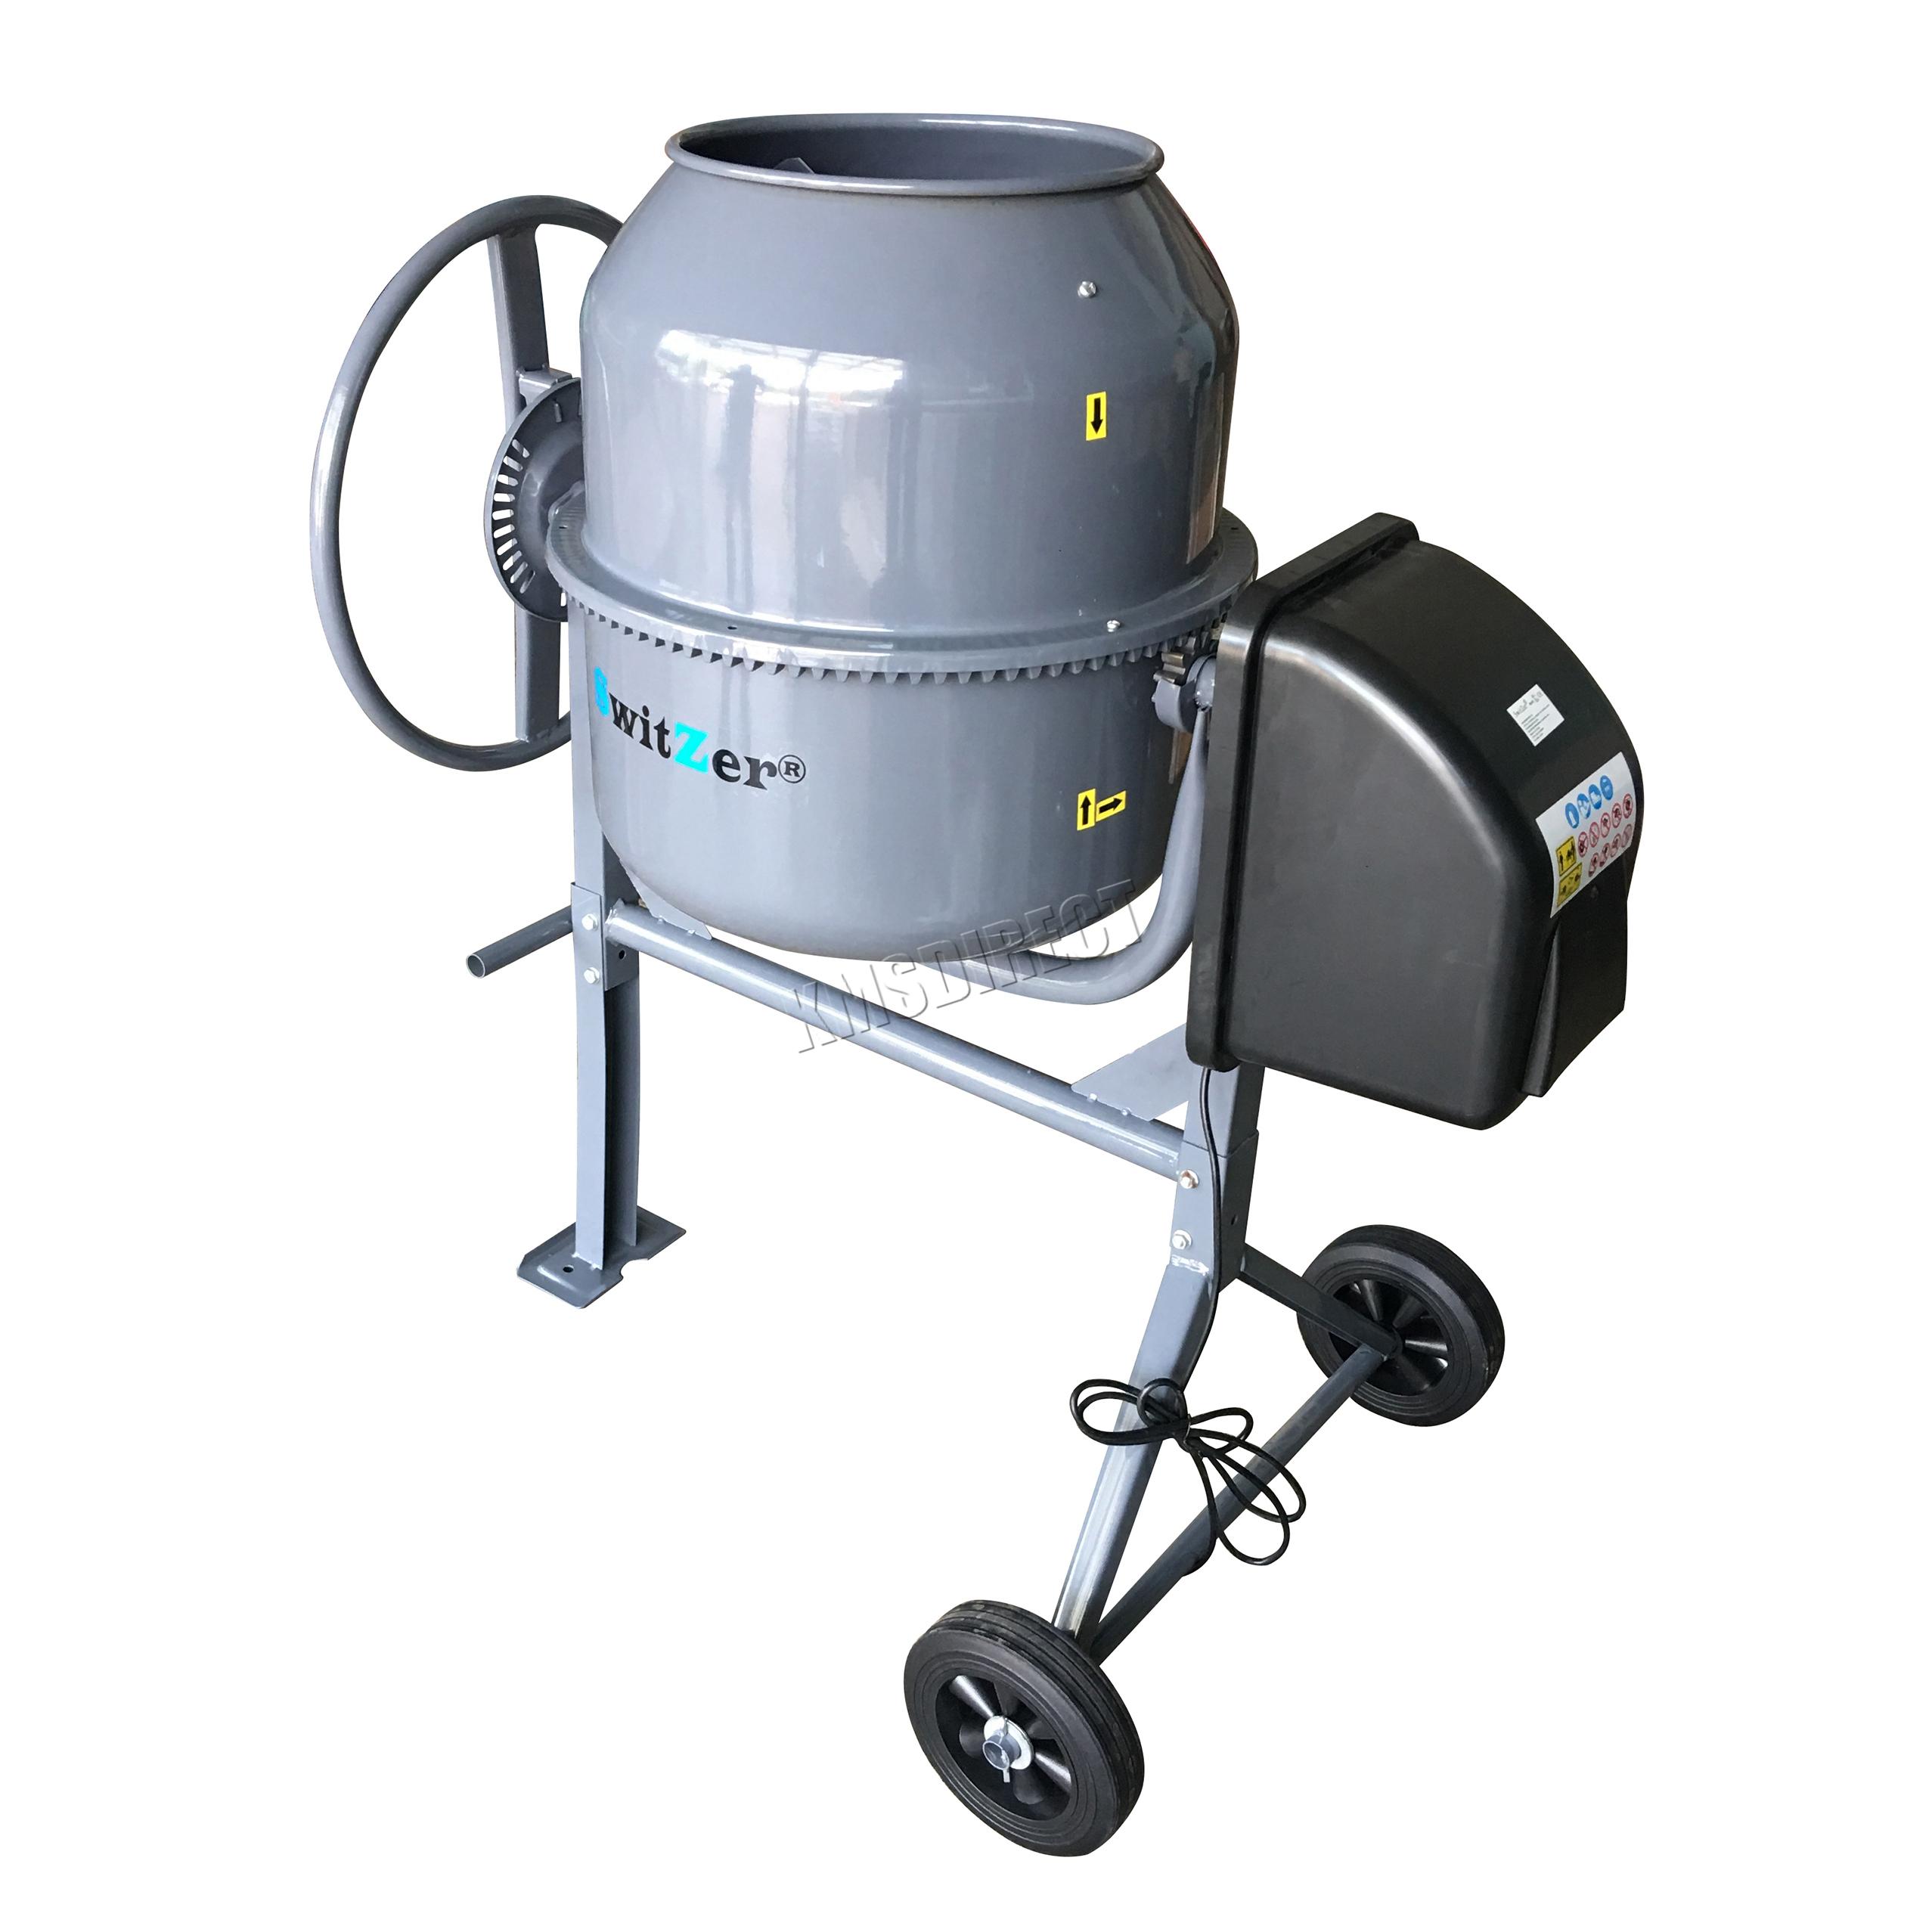 Switzer 550w Electric Concrete Cement Mixer Mortar Plaster